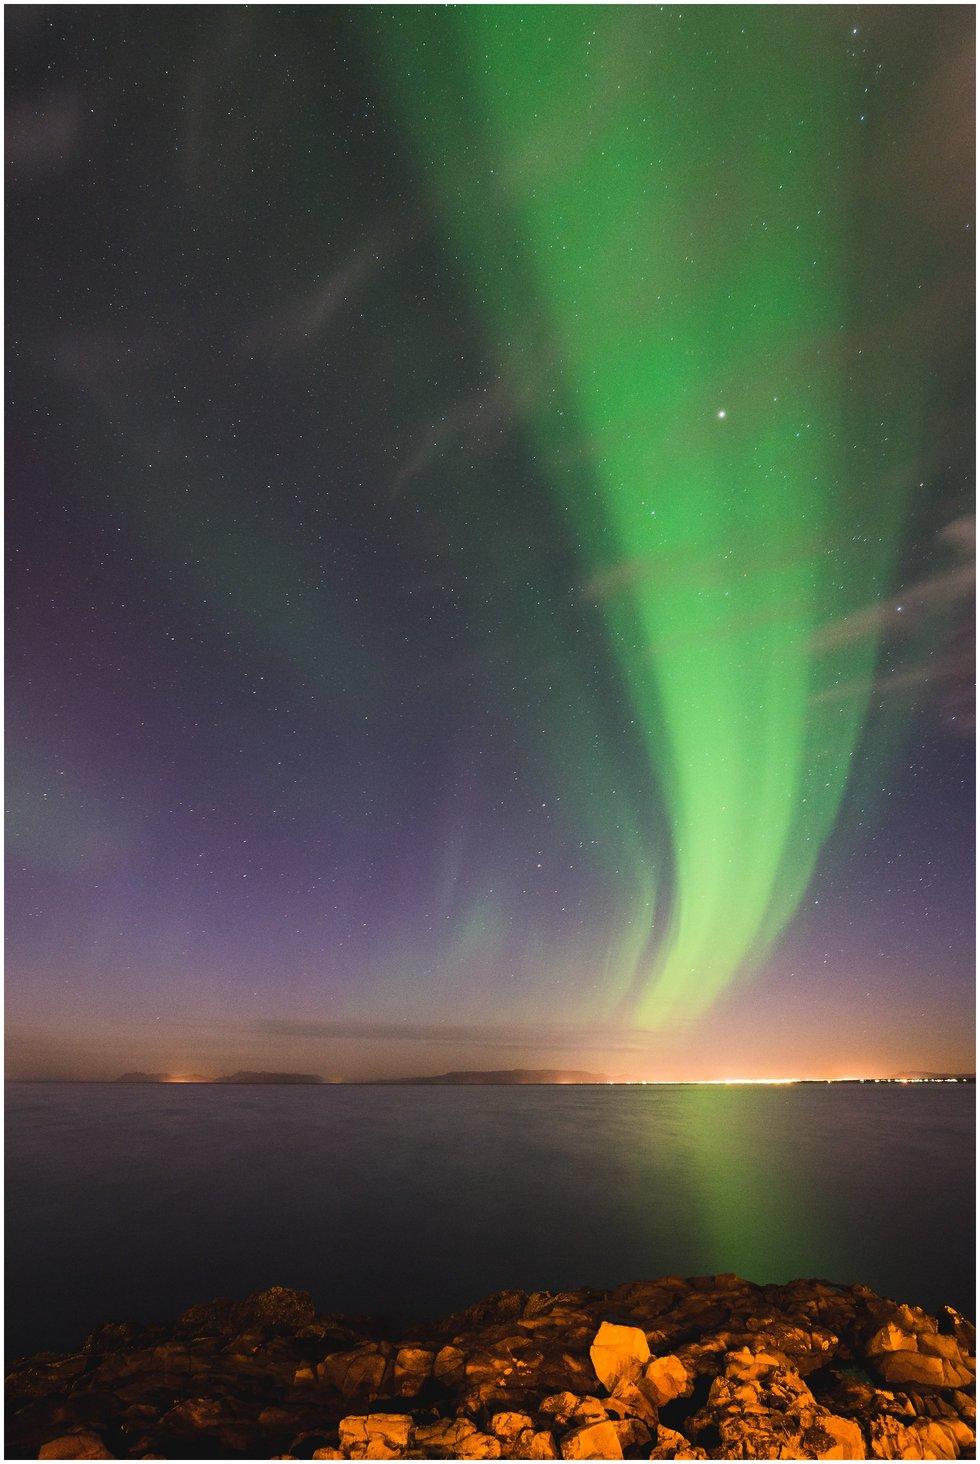 Iceland Wedding Photographer shot of Northern Lights